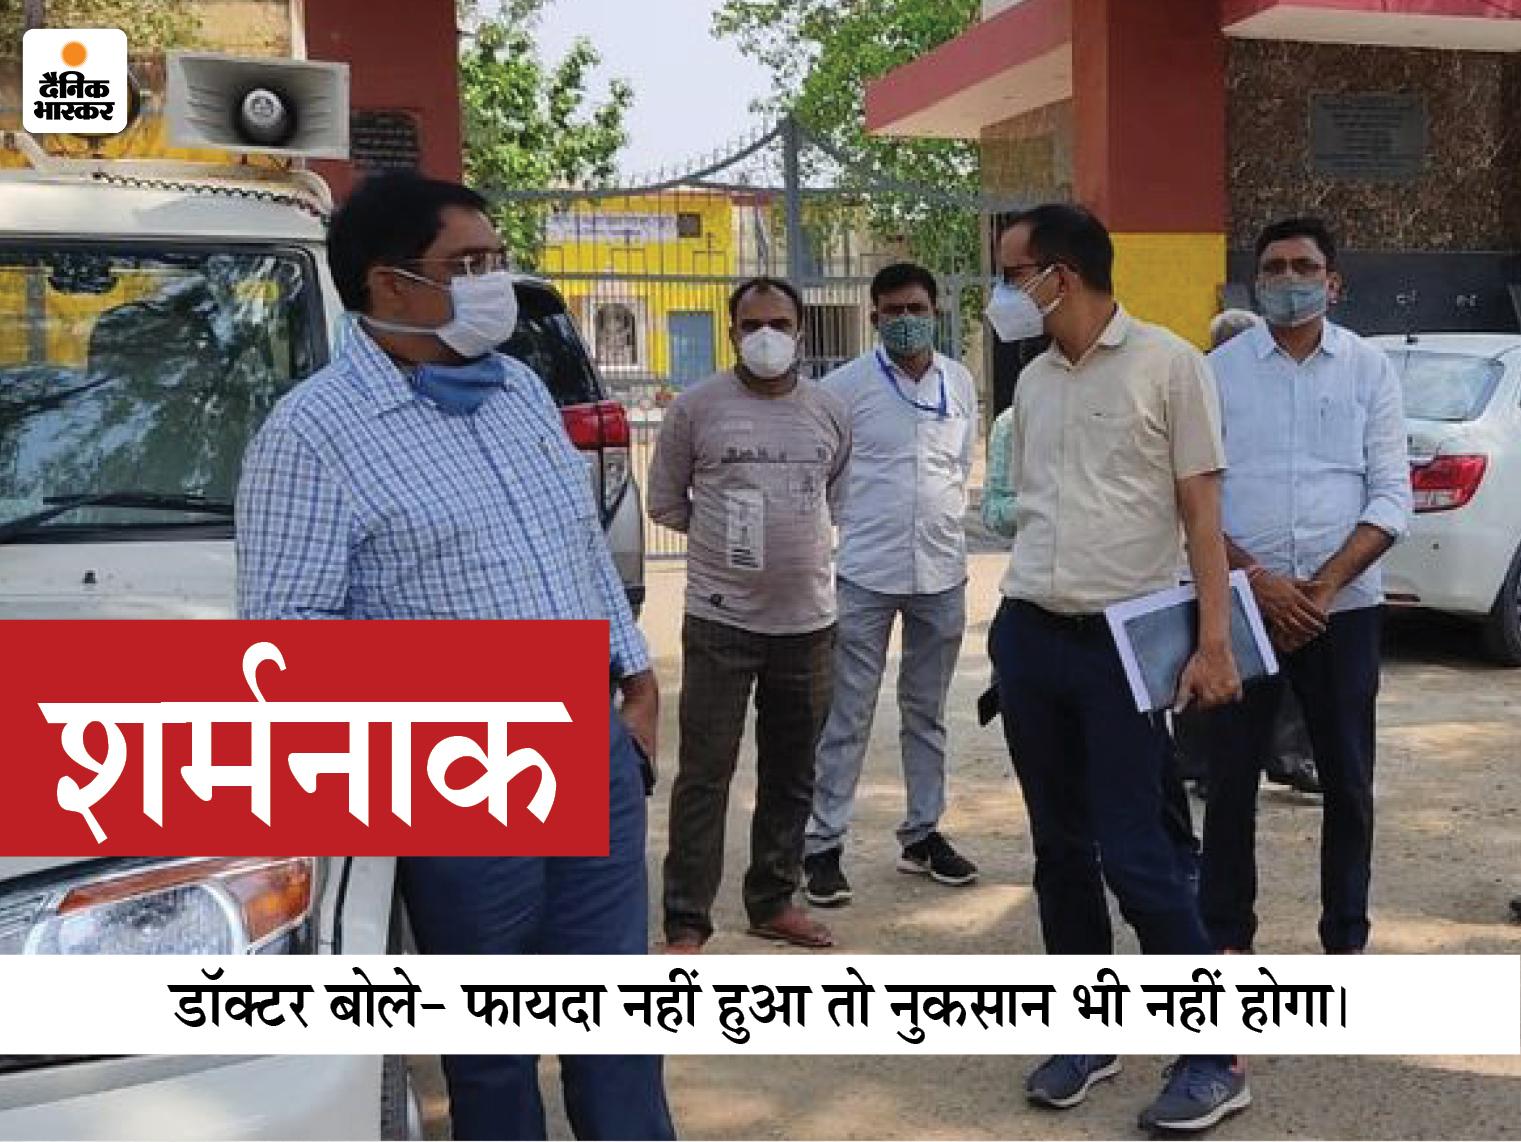 निजी अस्पताल को कोरोना मरीज भर्ती करने की अनुमति तक नहीं, इंजेक्शन भी असली या नकली पता नहीं|अलवर,Alwar - Dainik Bhaskar